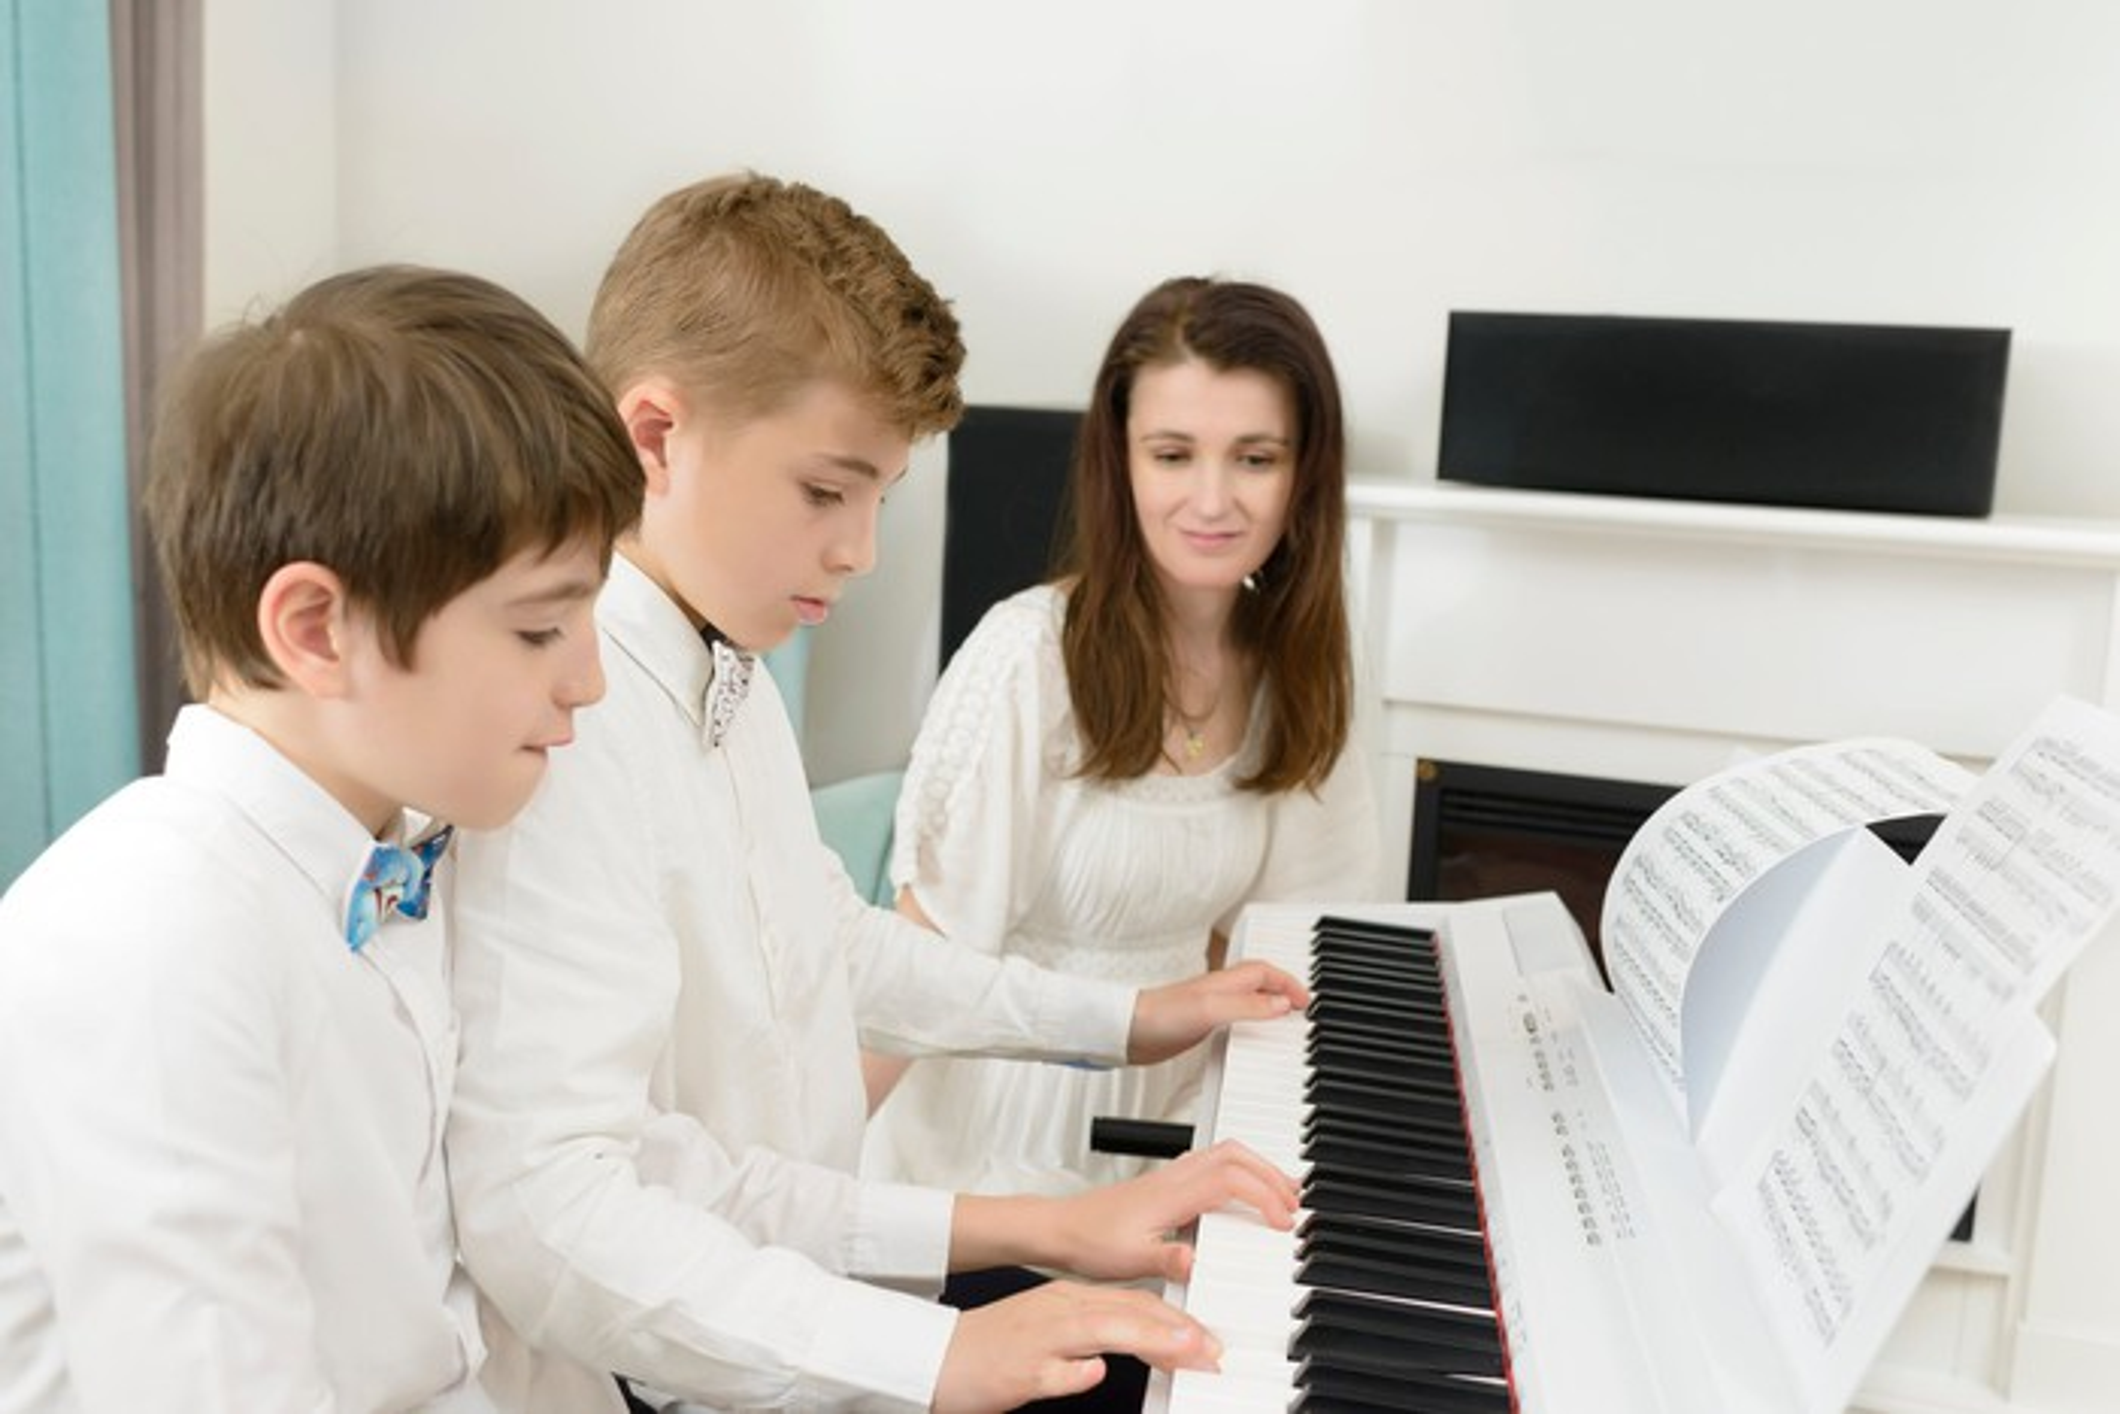 Music teacher teaching two boys how to play the piano.